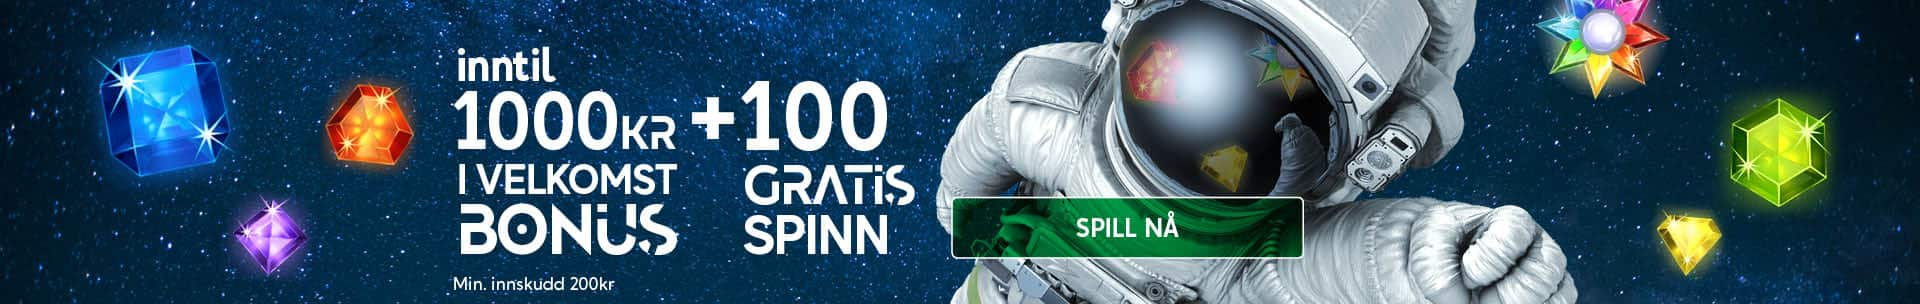 GoProCasino Content Images 03 - Norway CasinoTop